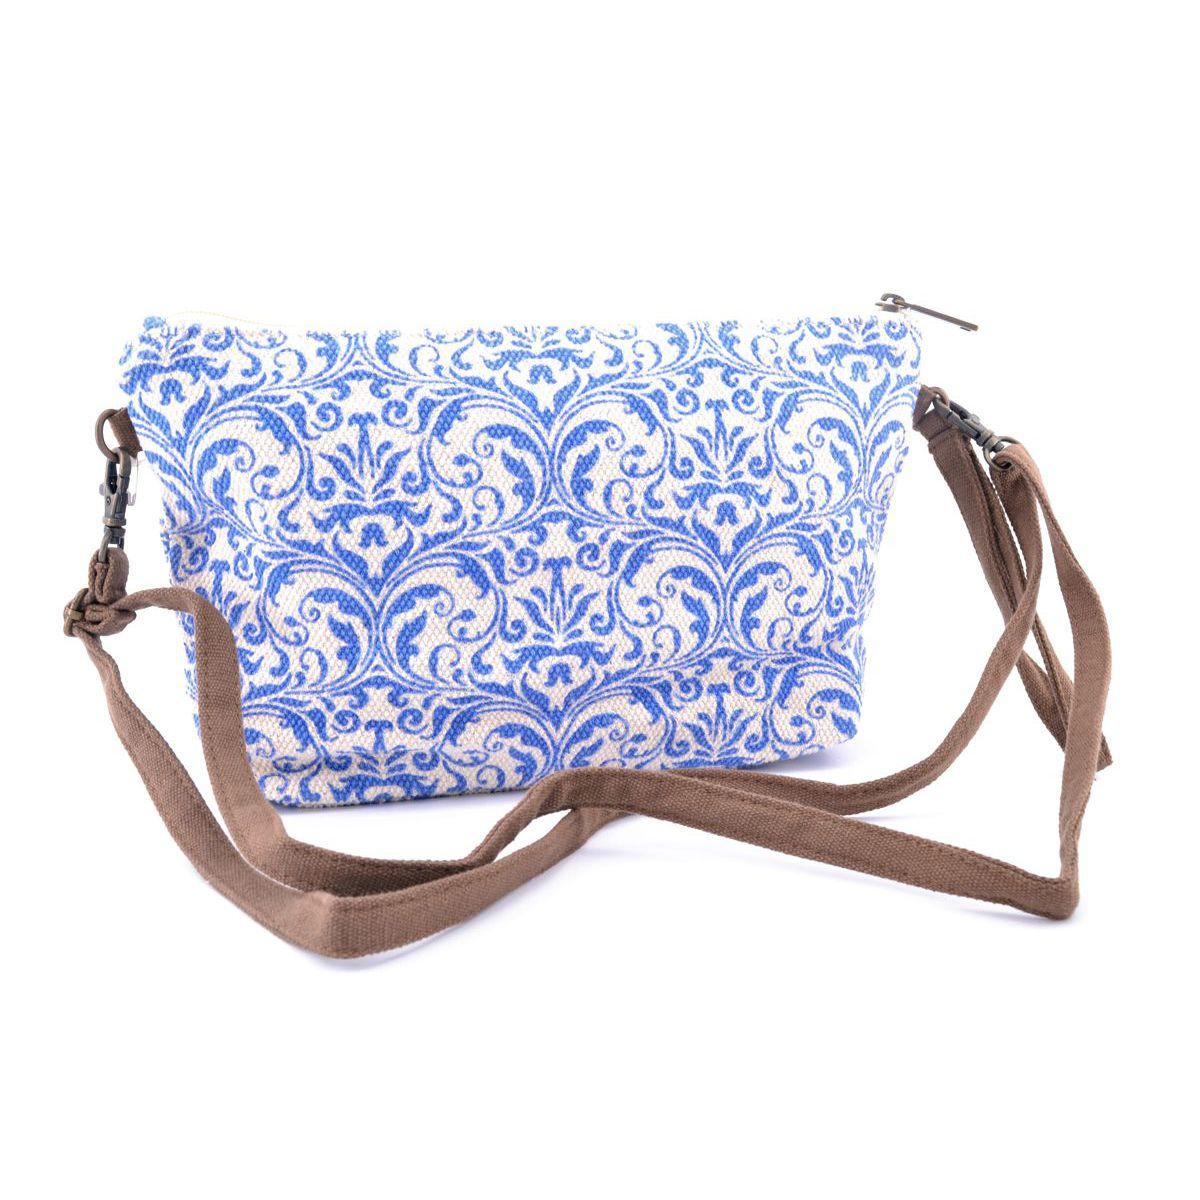 Dani Rosie E19B451 handbag Blue VestoPazzo